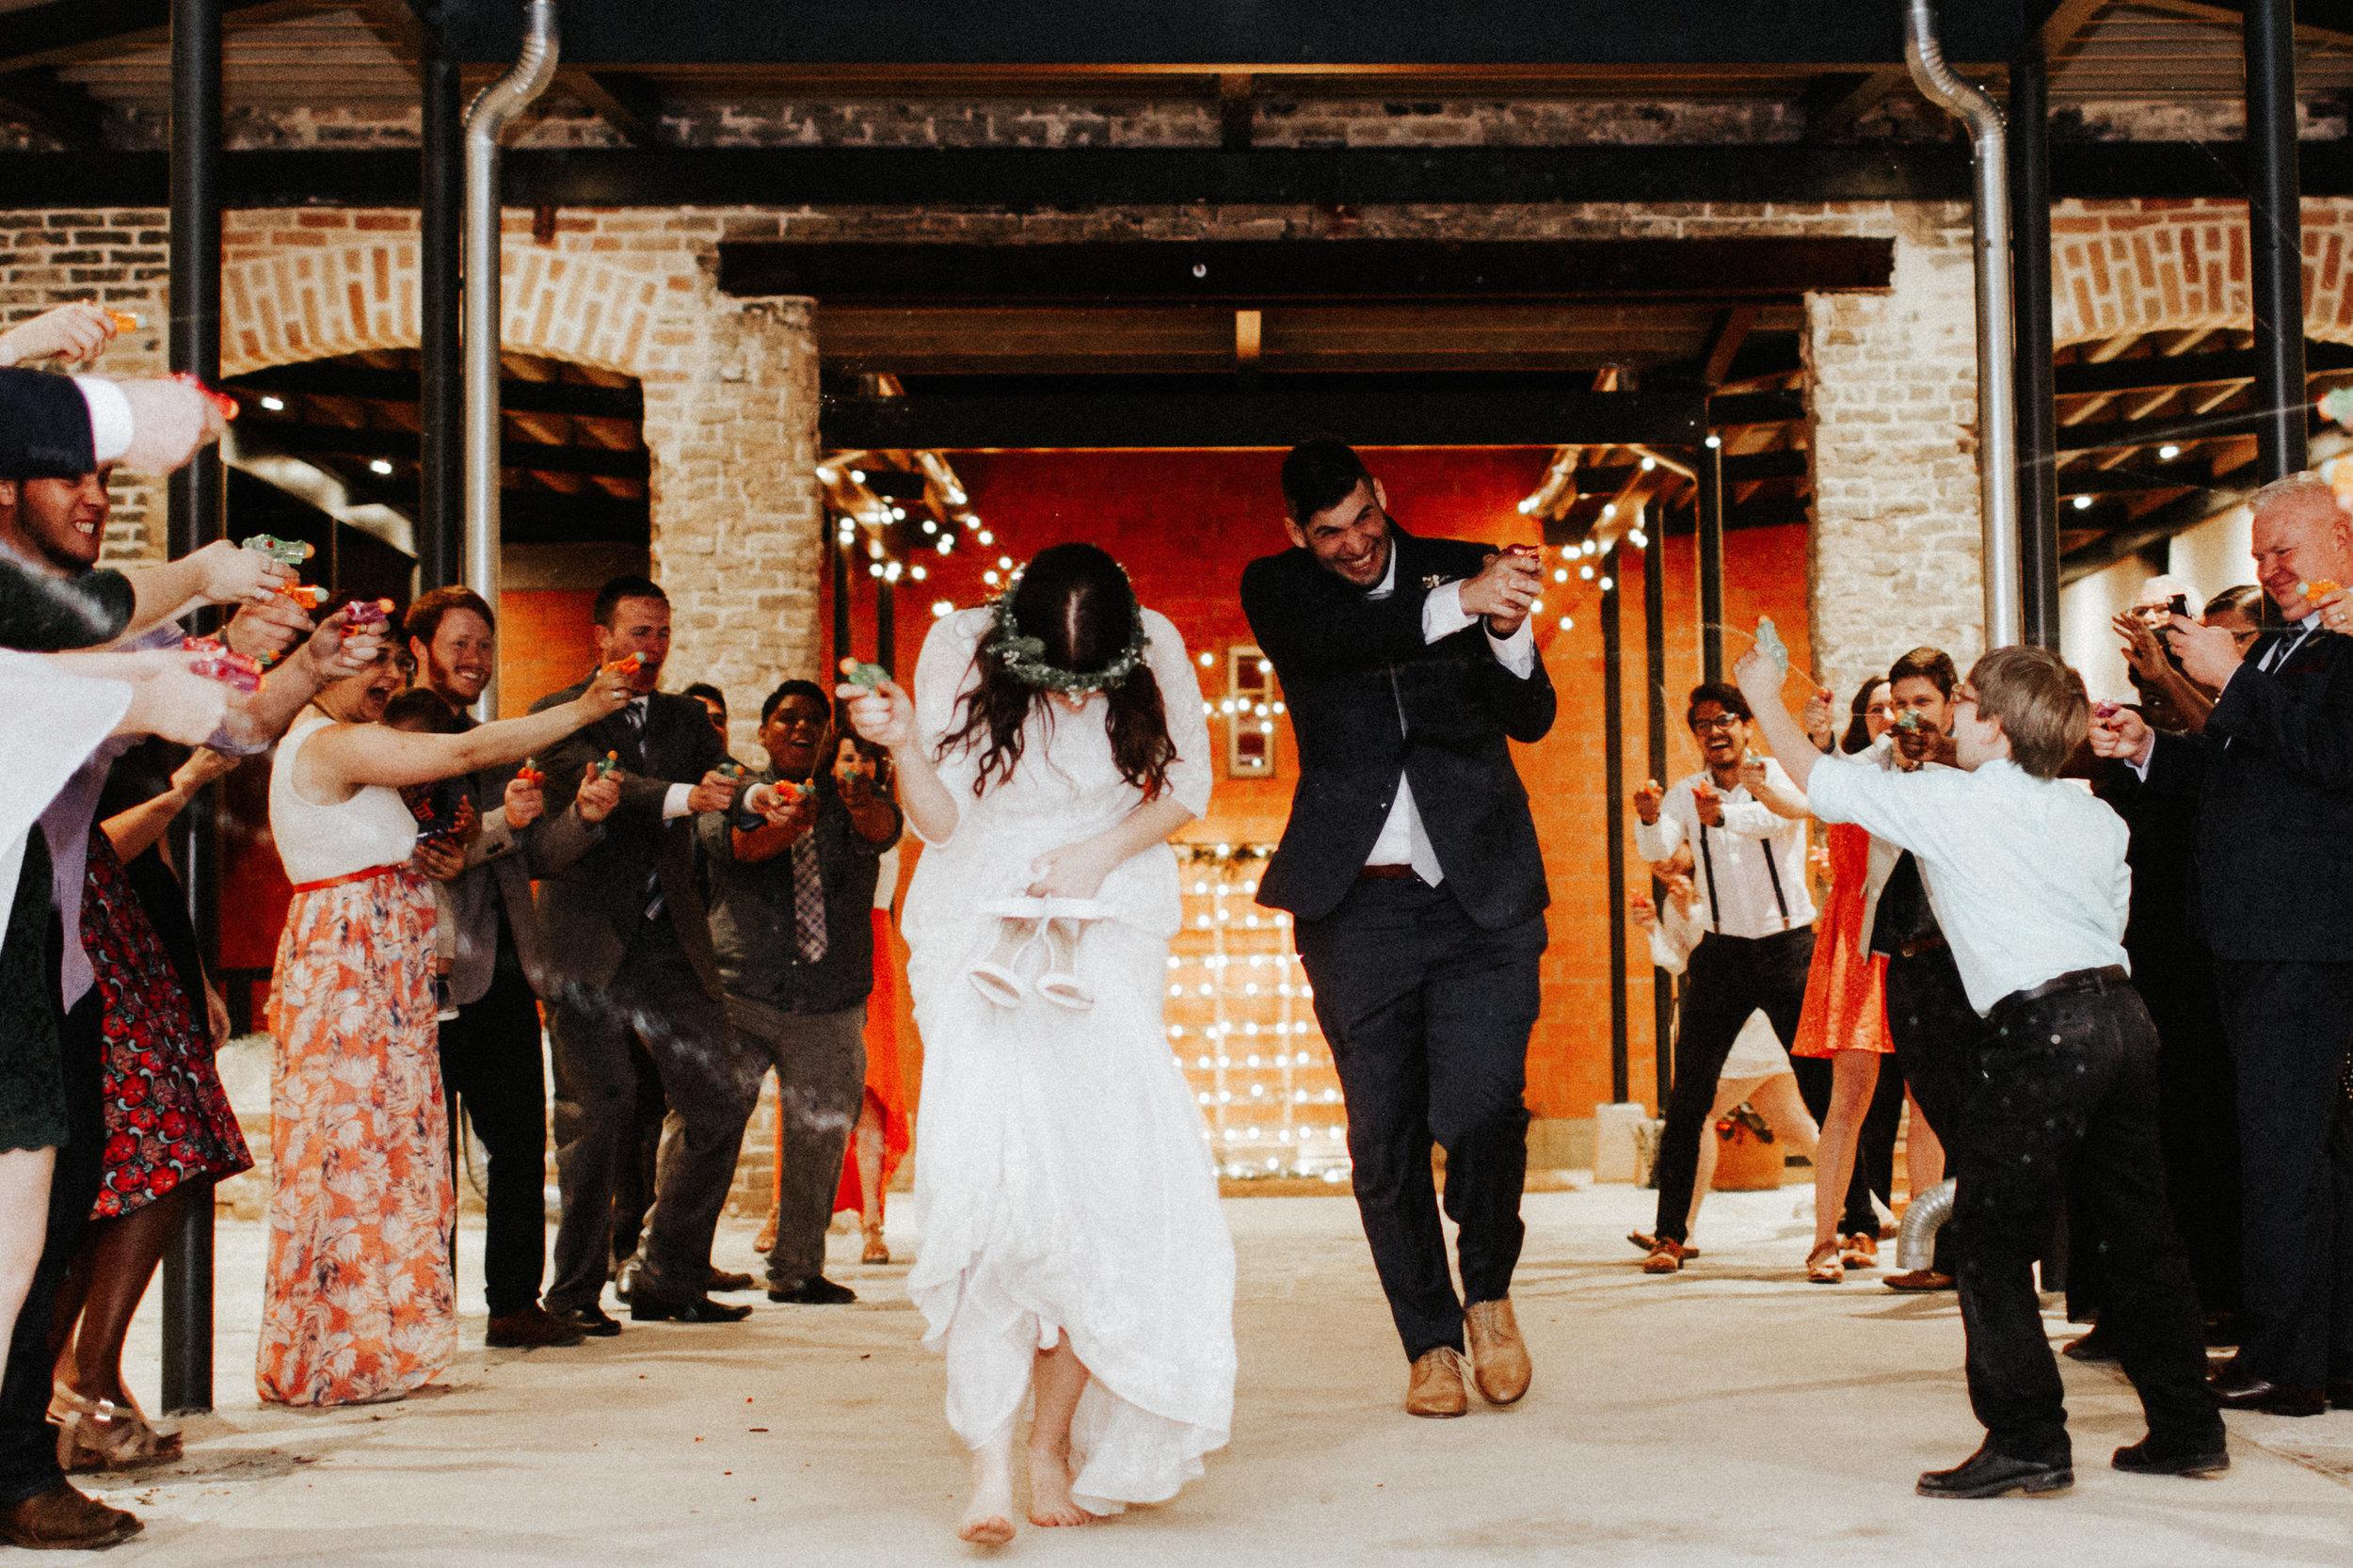 austin-wedding-photographer-67.jpg